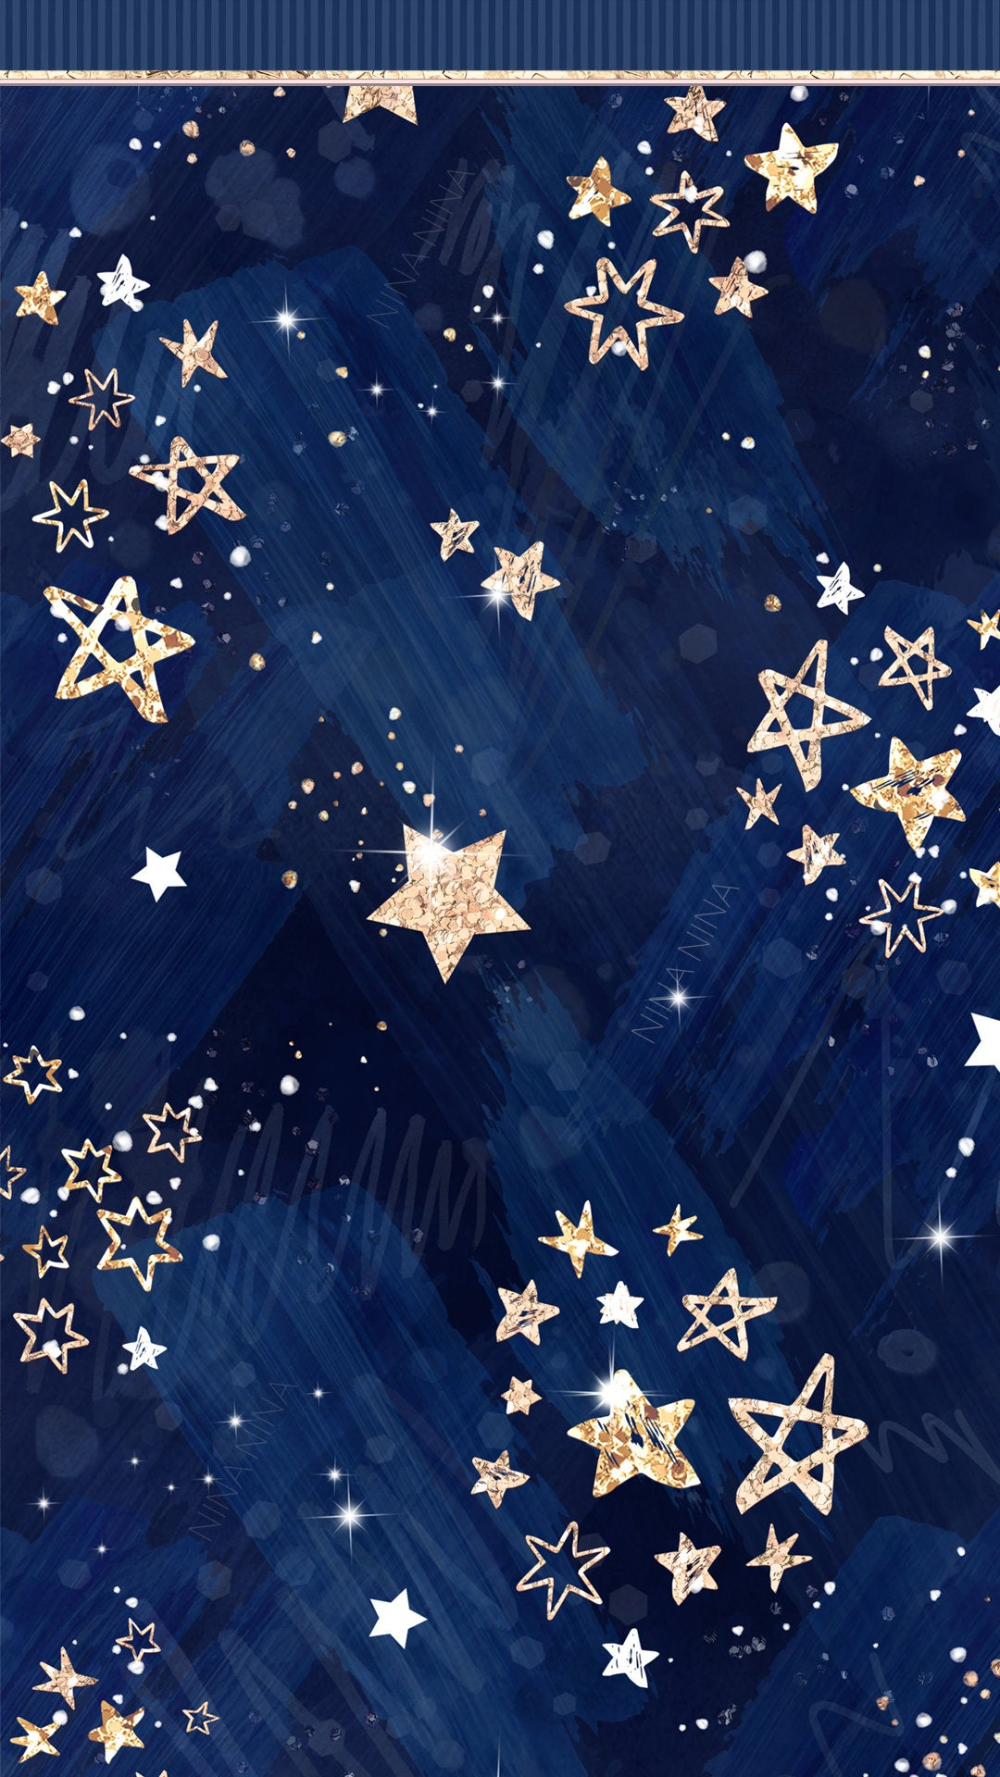 Stellar by NinaNinaCraft, Watercolor Stars Digital